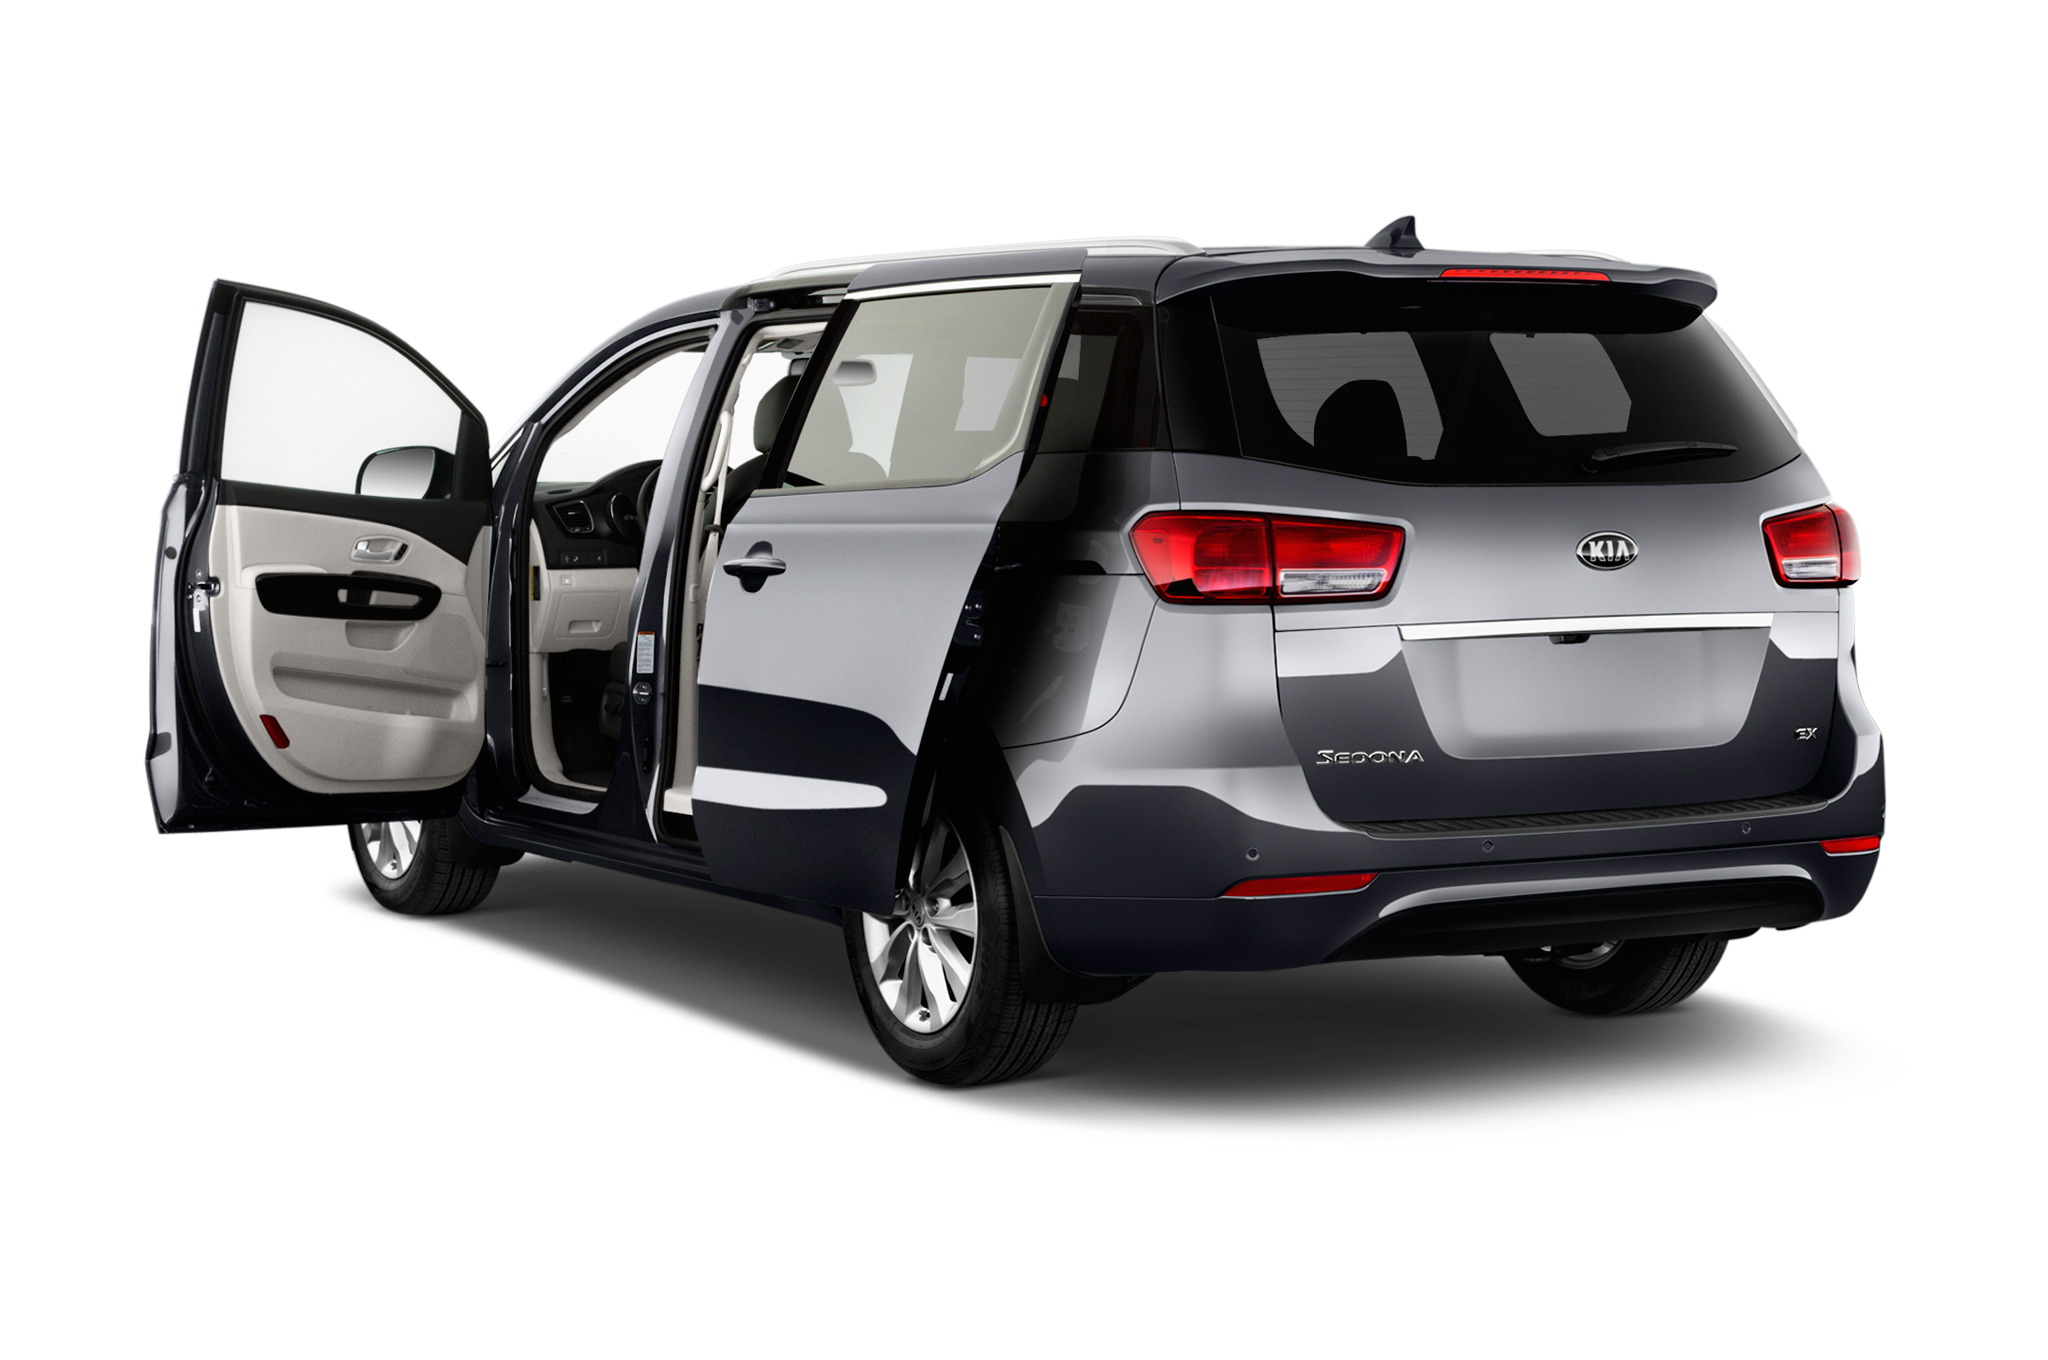 2015 kia sedona pricing fuel economy announced. Black Bedroom Furniture Sets. Home Design Ideas